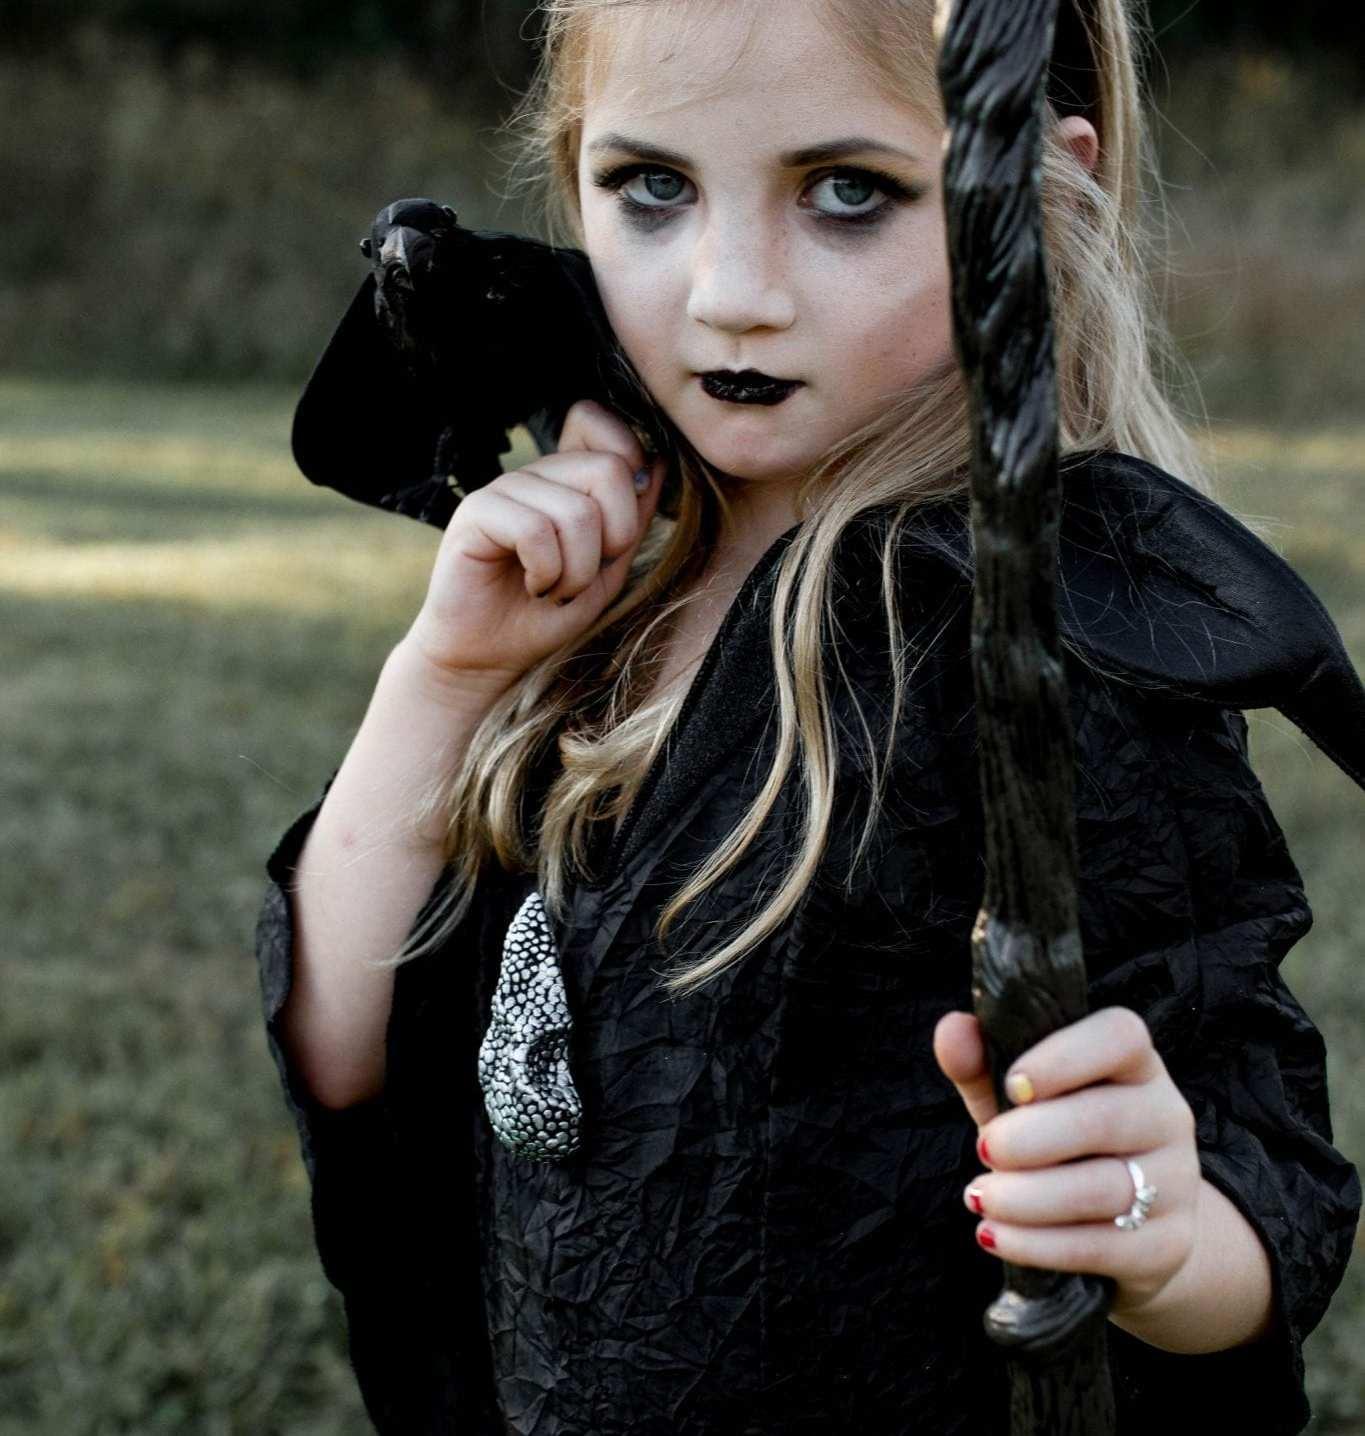 maleficent crow upclose 2